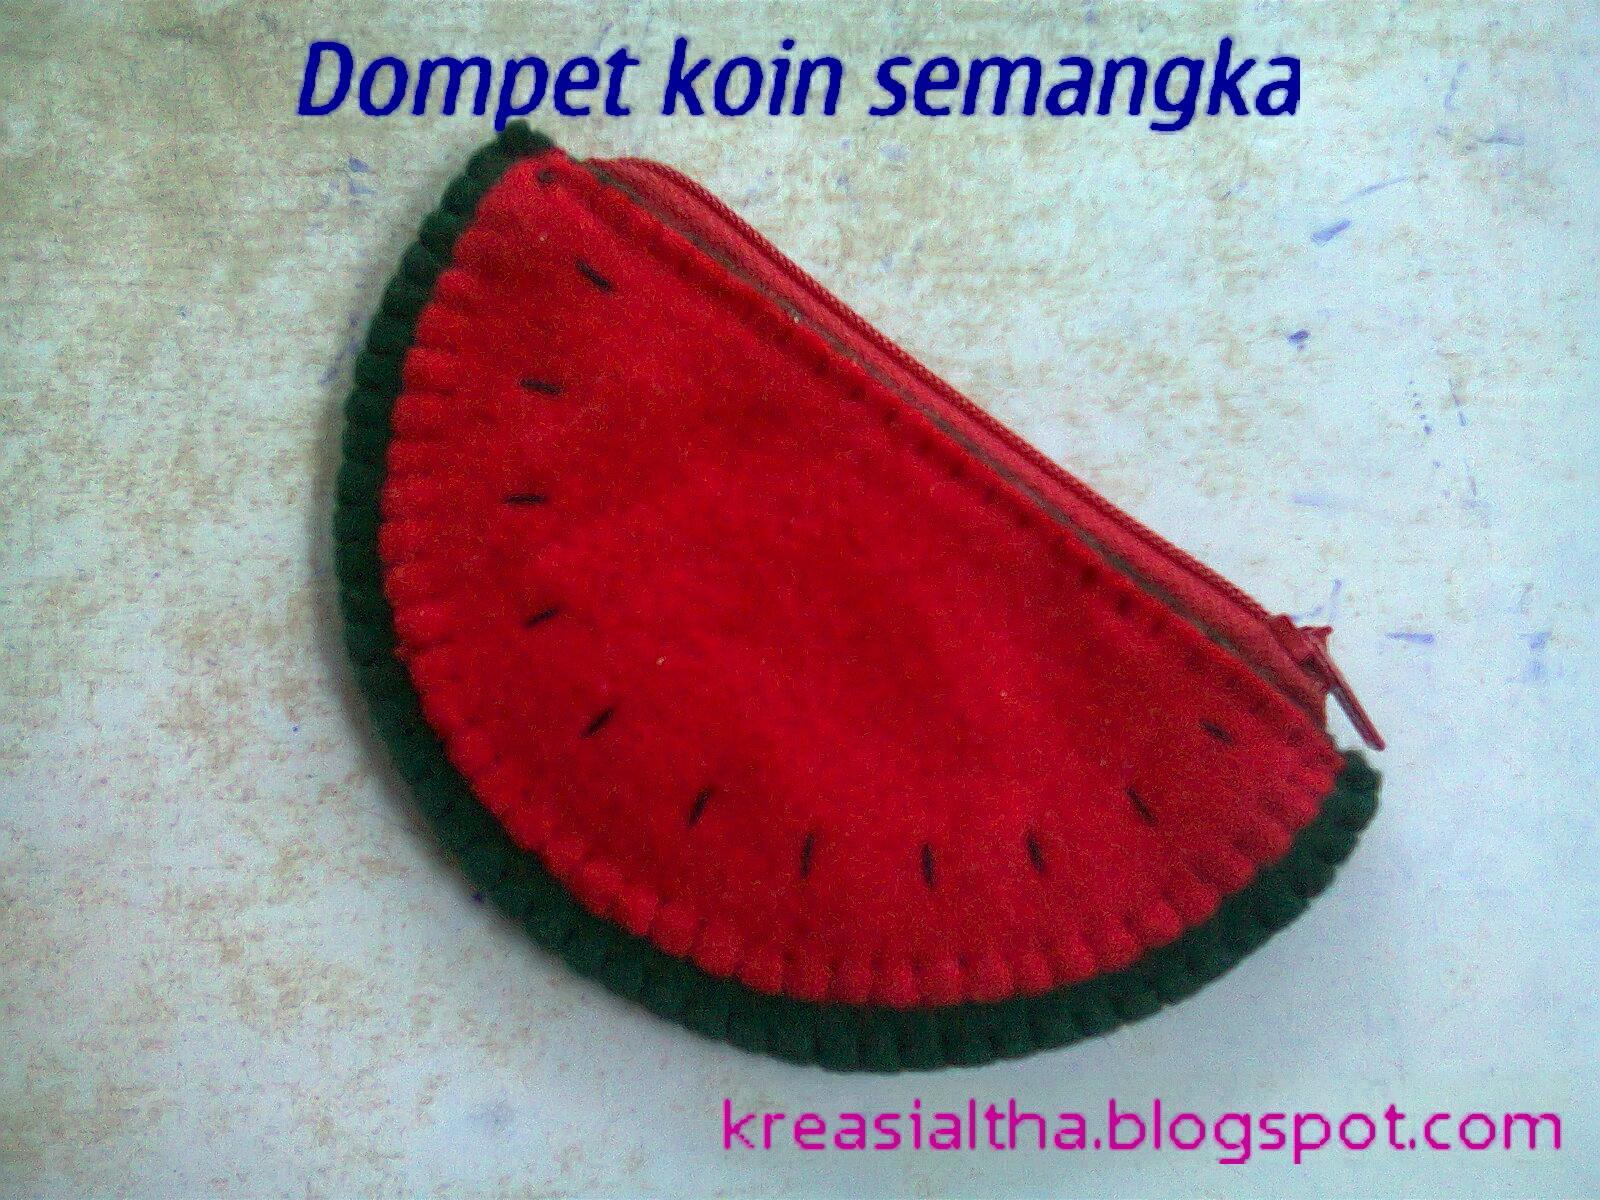 dompet koin semangka